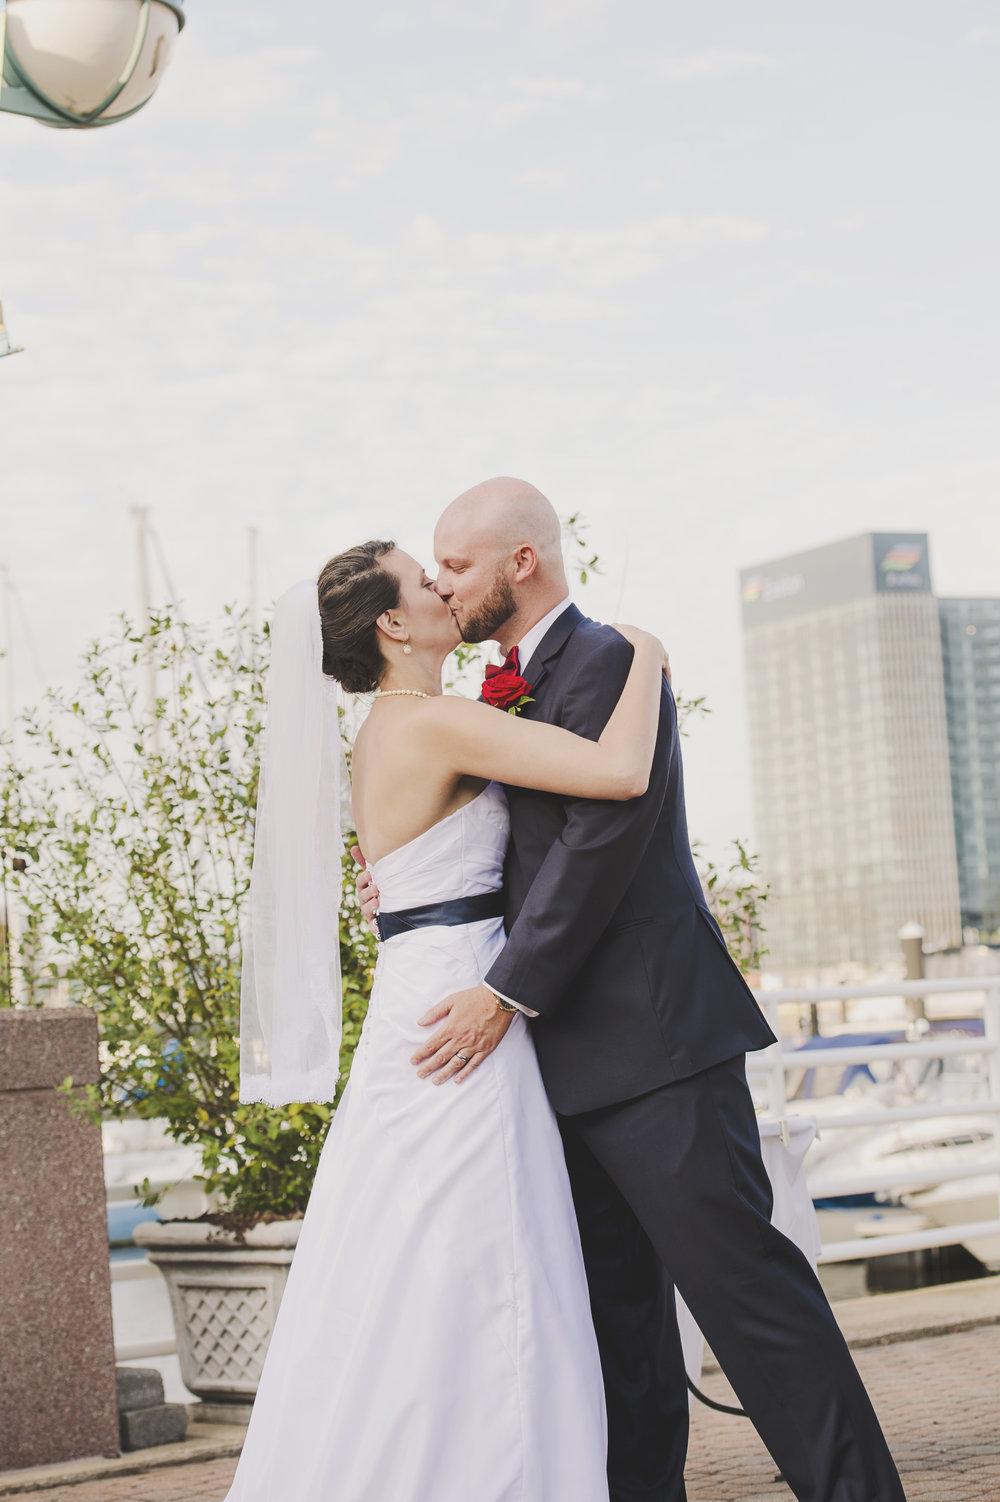 Baltimore wedding_Montana Wedding Photographer_Missoula Wedding Photographer_Ceremony_You may now kiss the bride